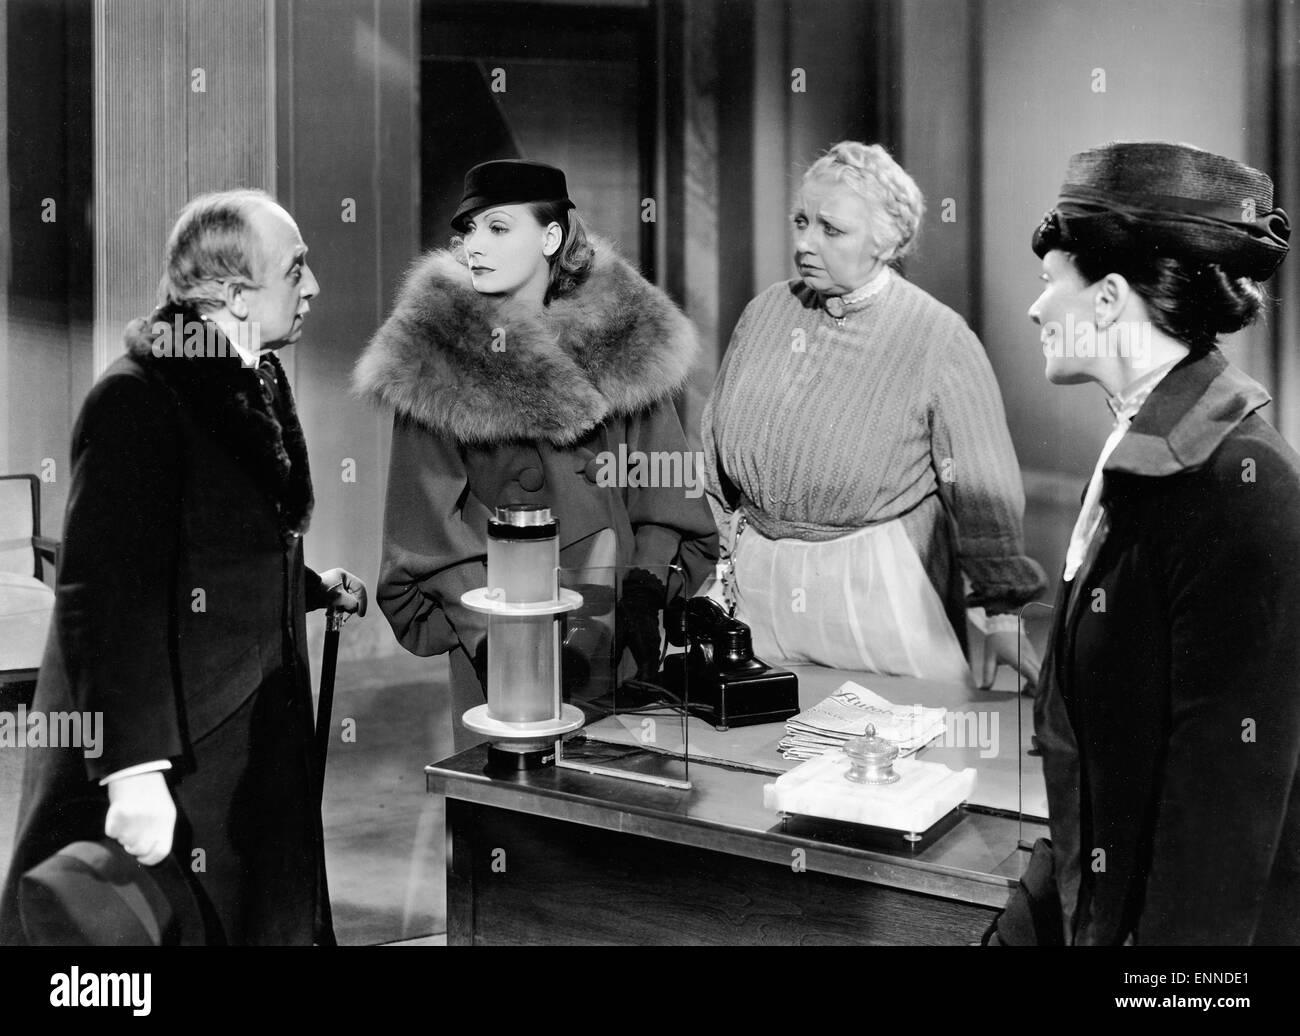 grand hotel usa 1932 aka menschen im hotel regie edmund stock photo royalty free image. Black Bedroom Furniture Sets. Home Design Ideas